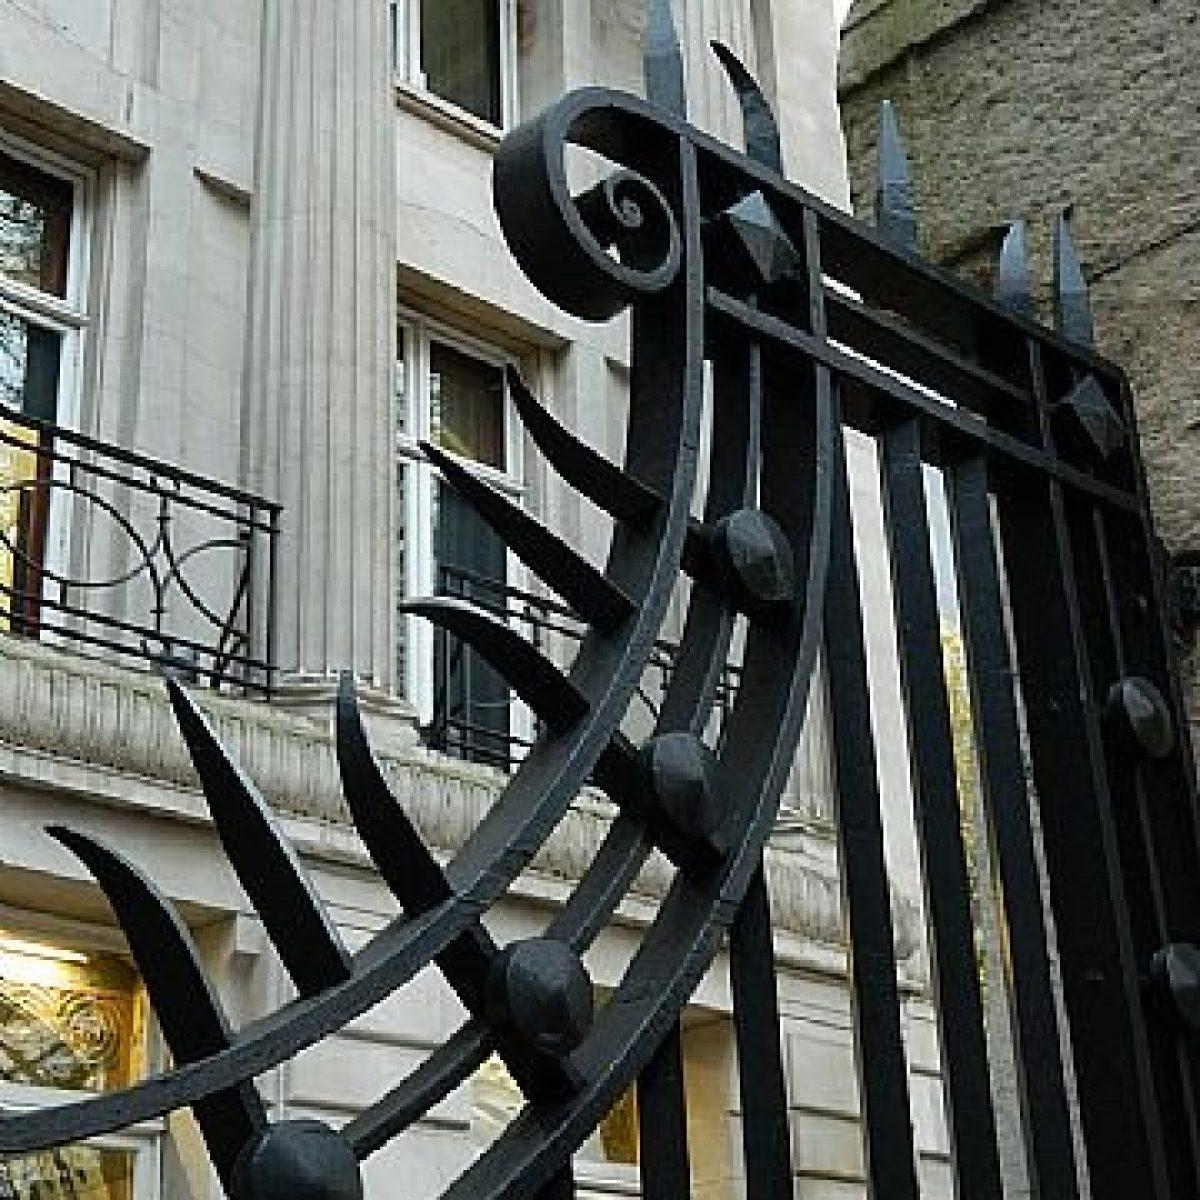 Restoration Heritage Cast & Wrought Iron Railings & Gates